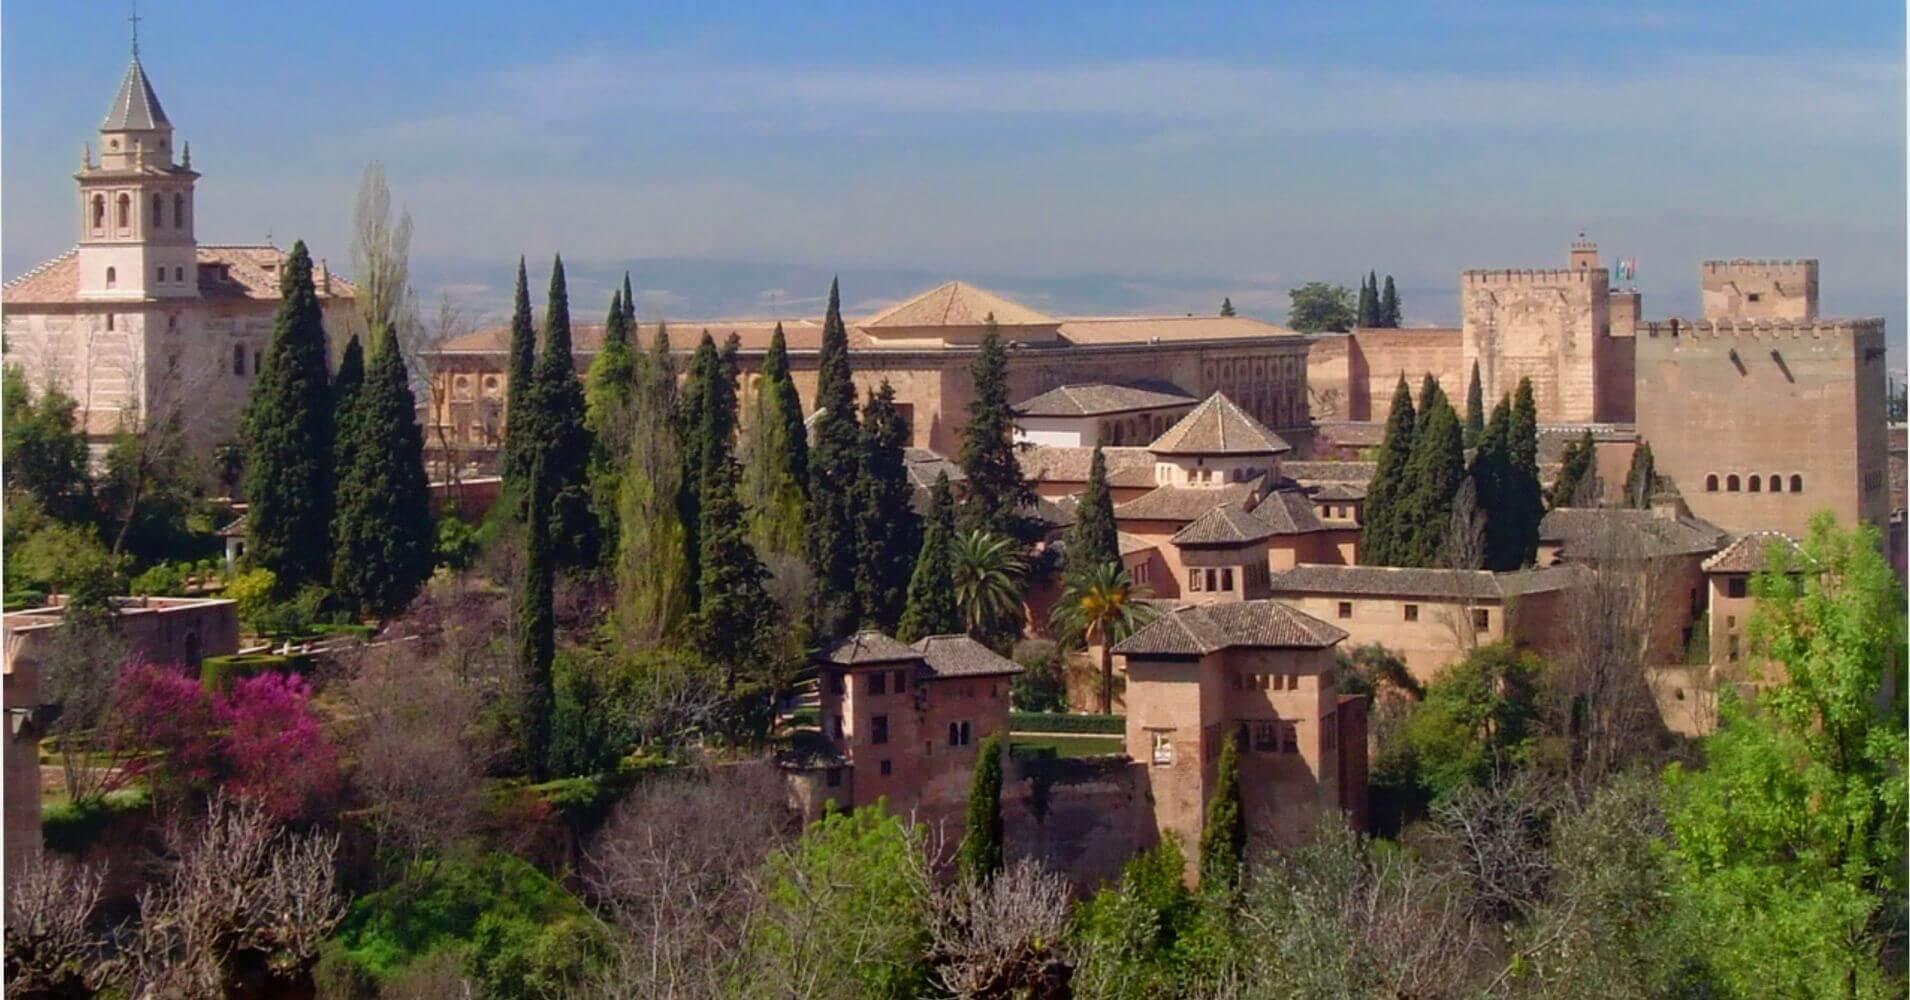 Viajar a Andalucía. La Alhambra. Granada. Andalucía.